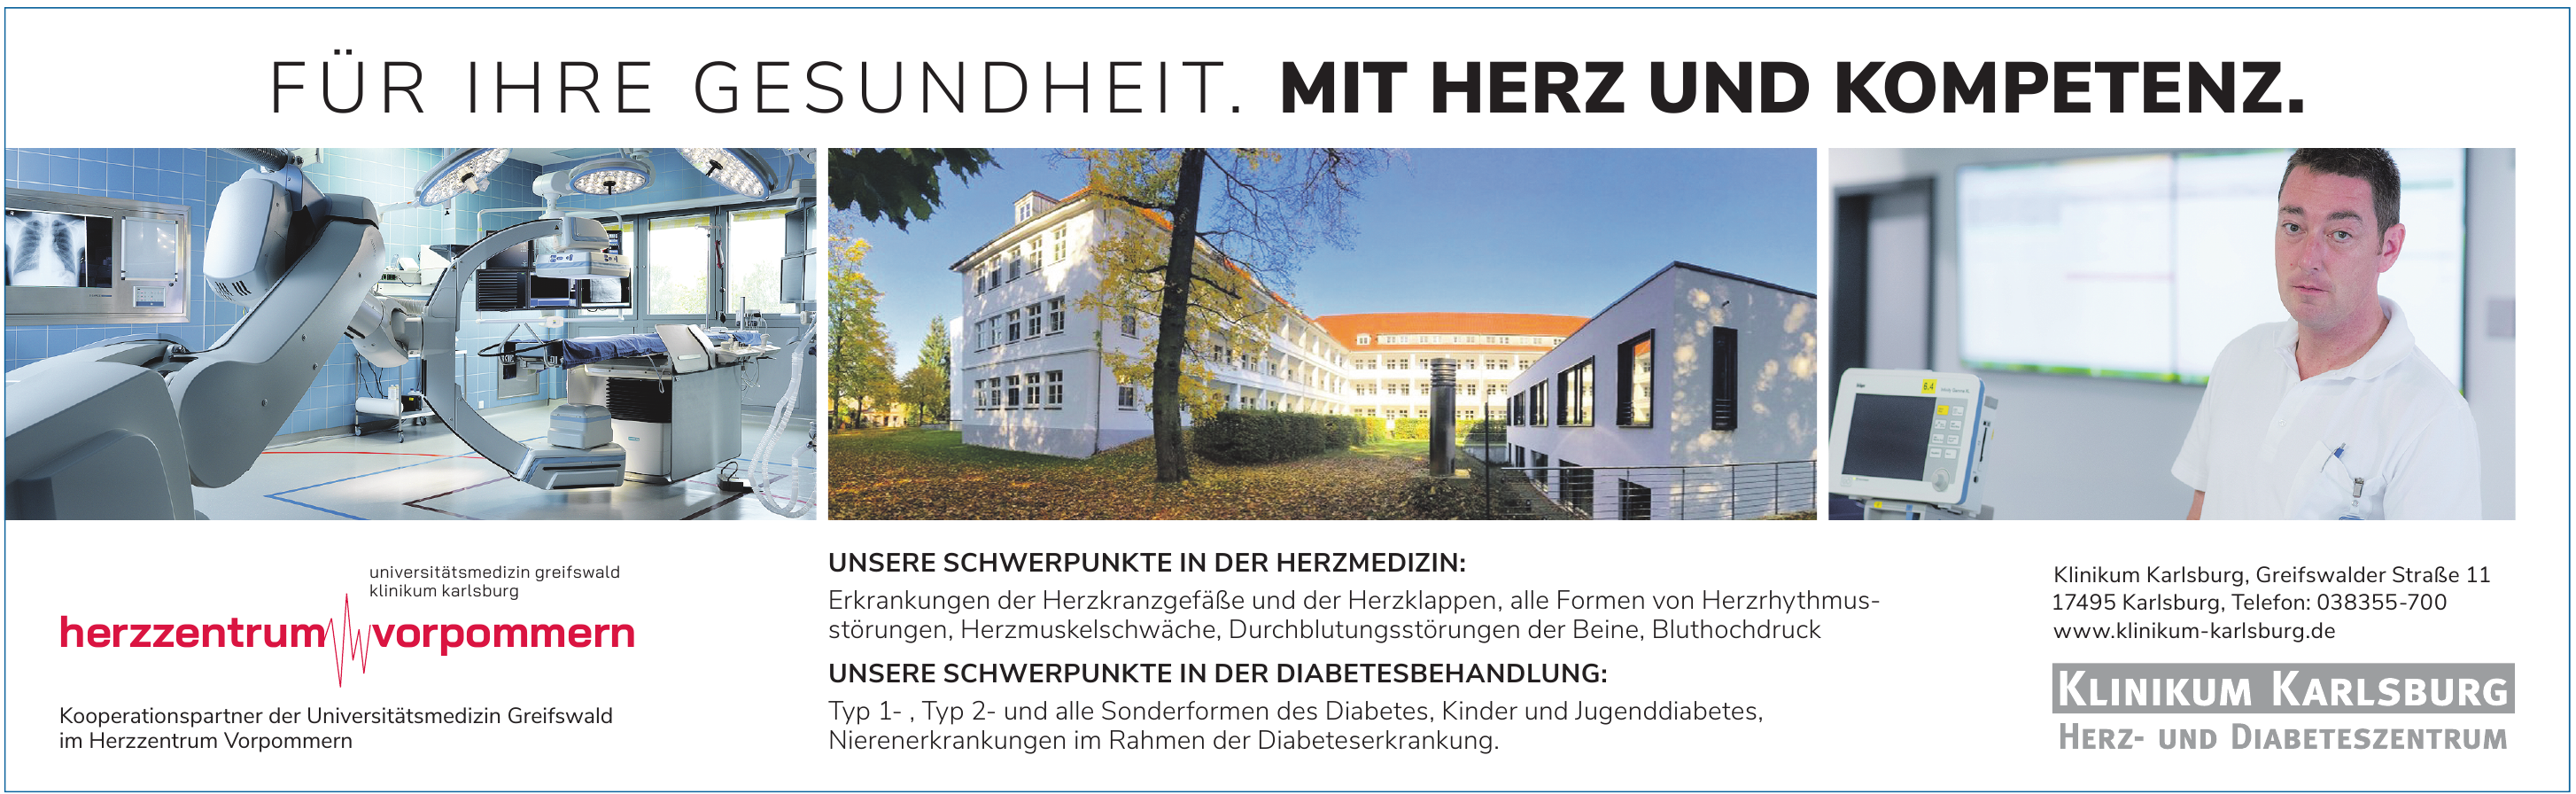 Klinikum Karlsburg